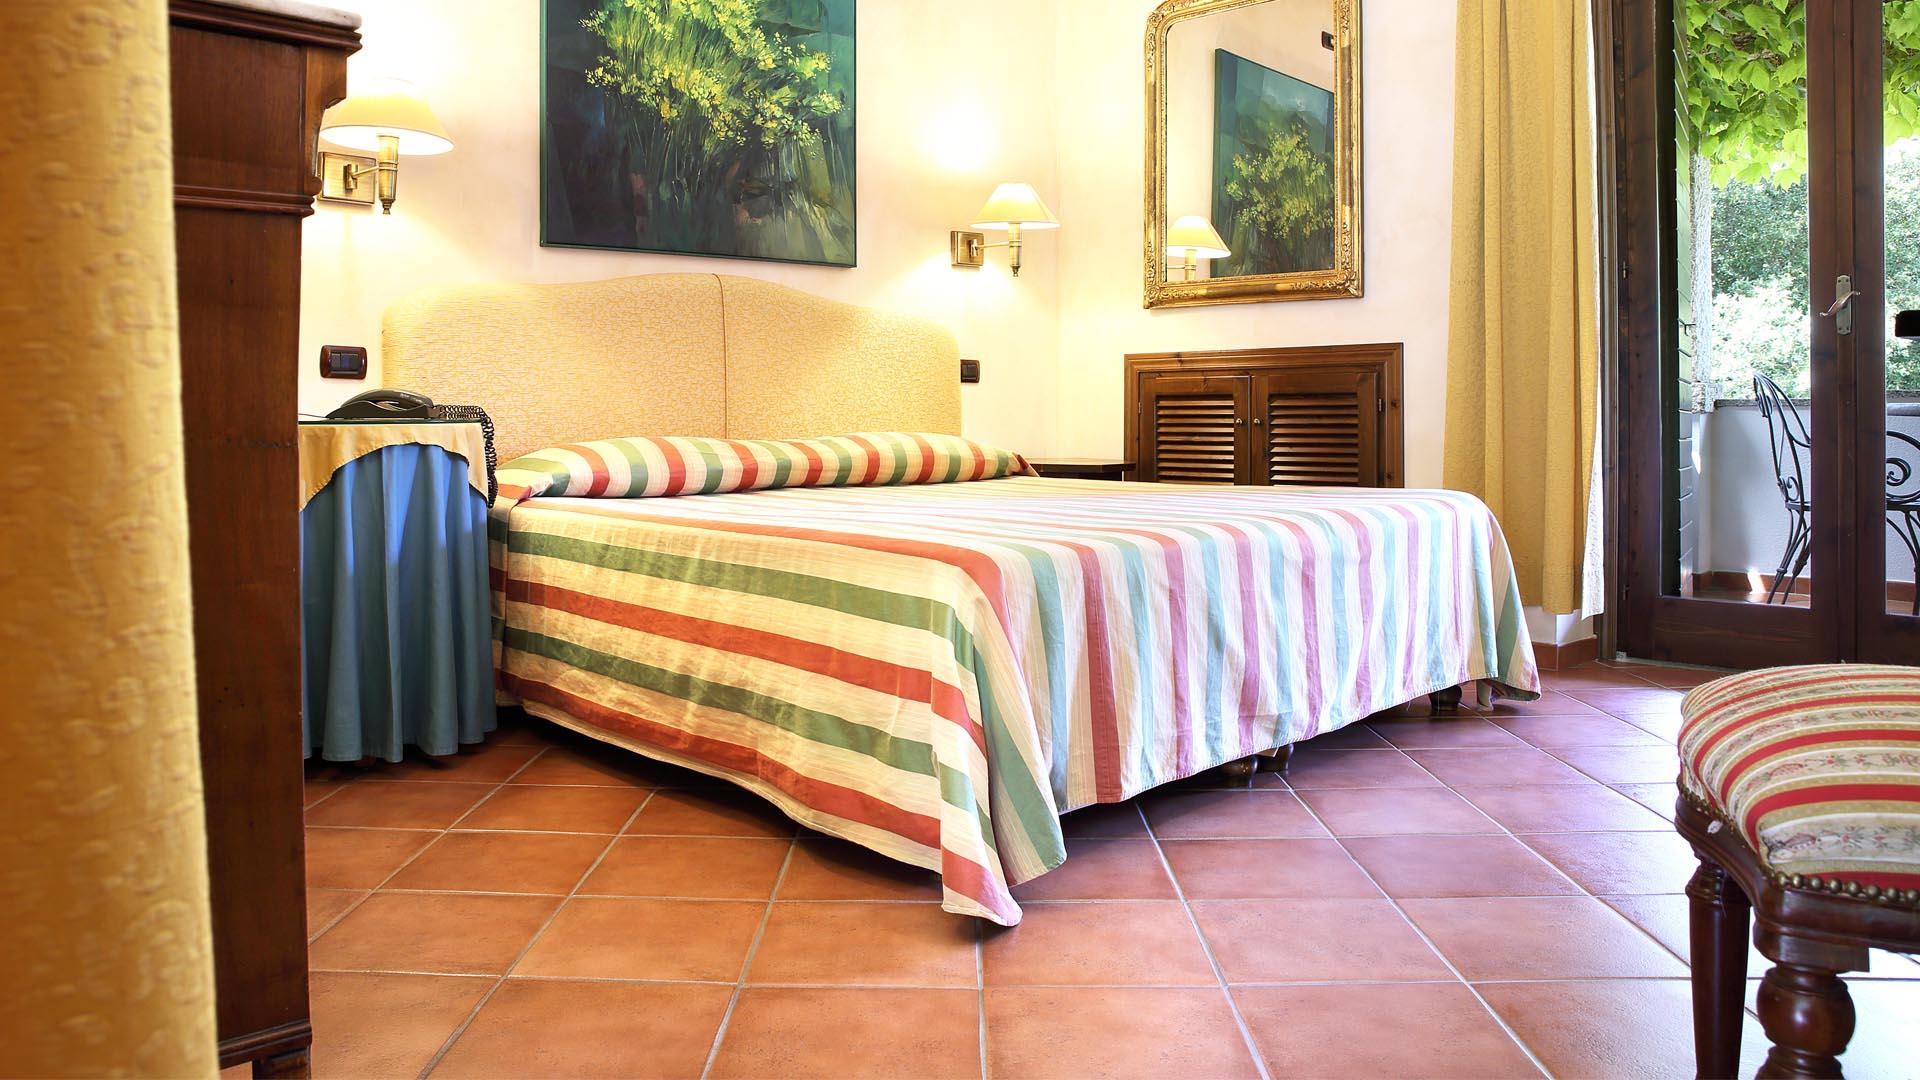 Le-Camere-Comfort-Agnata-01